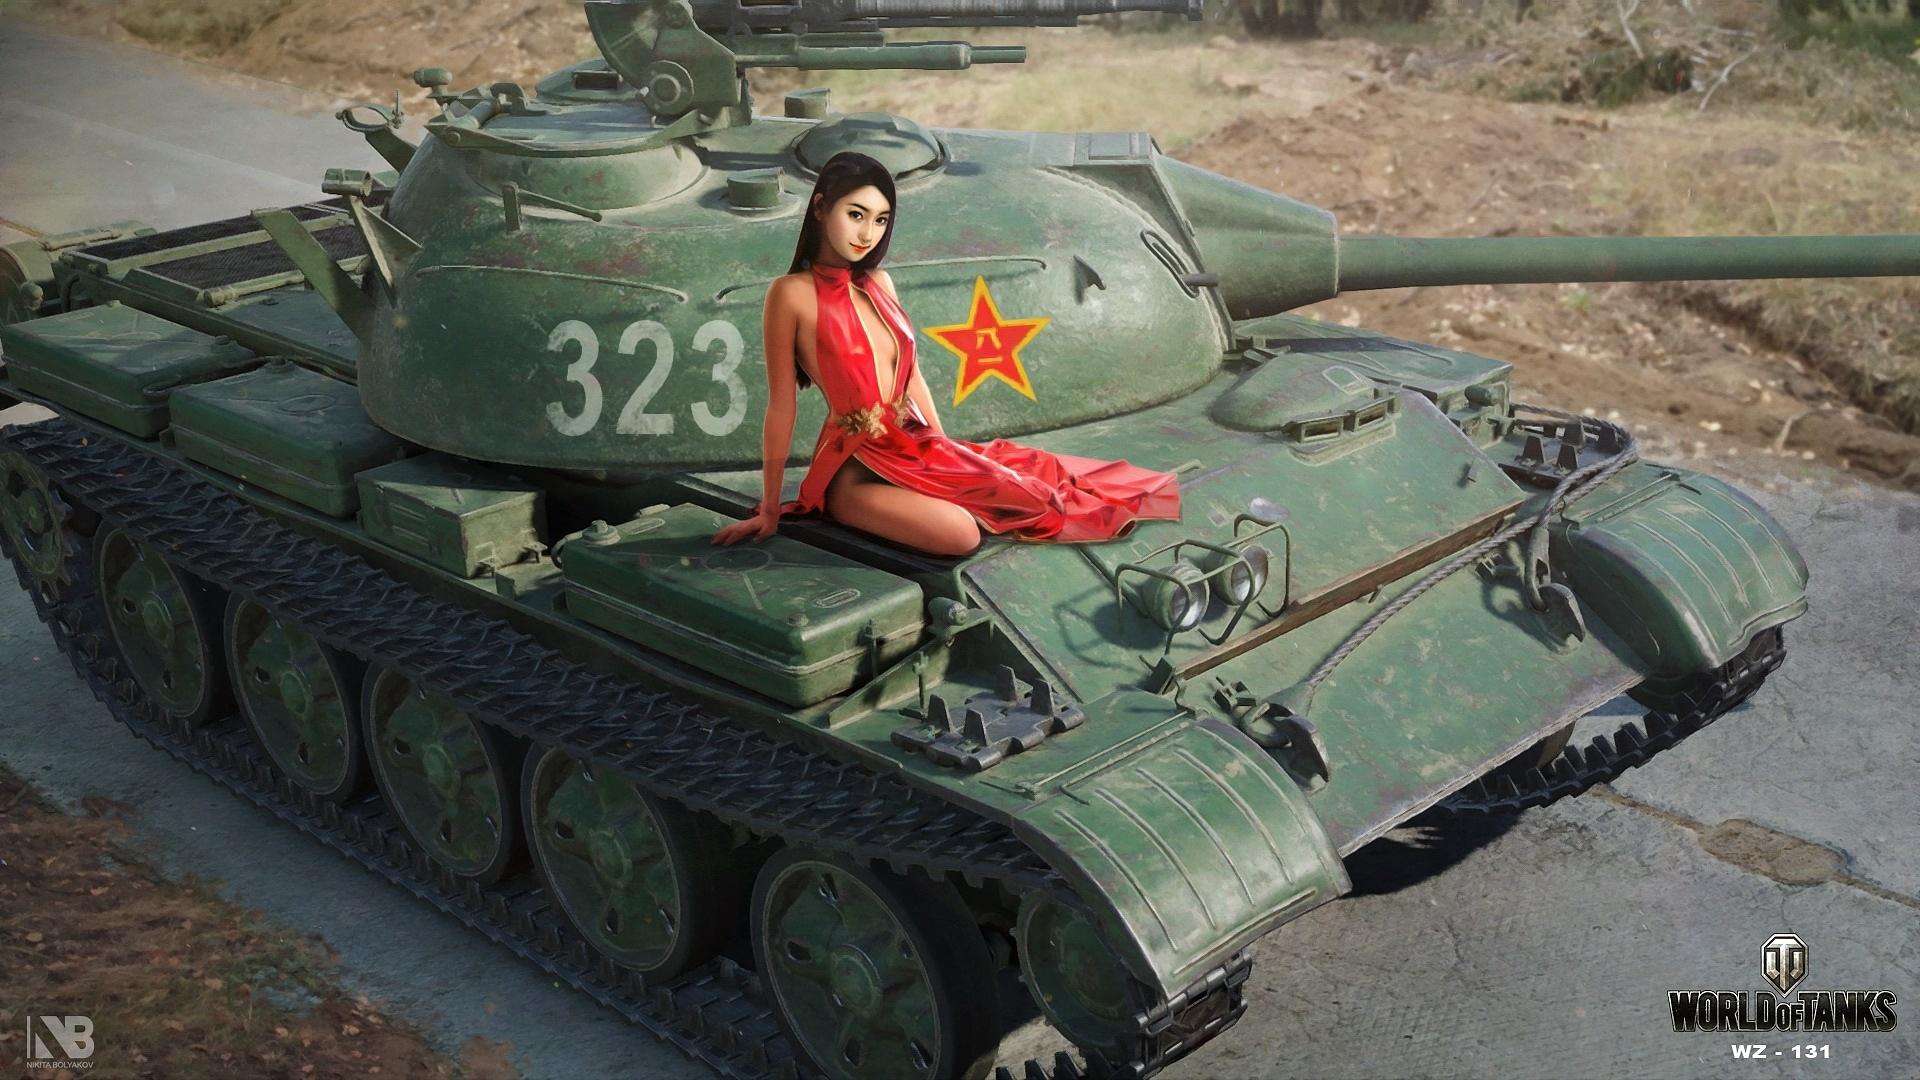 Fondos De Pantalla Mundo De Tanques Chica China Sexy